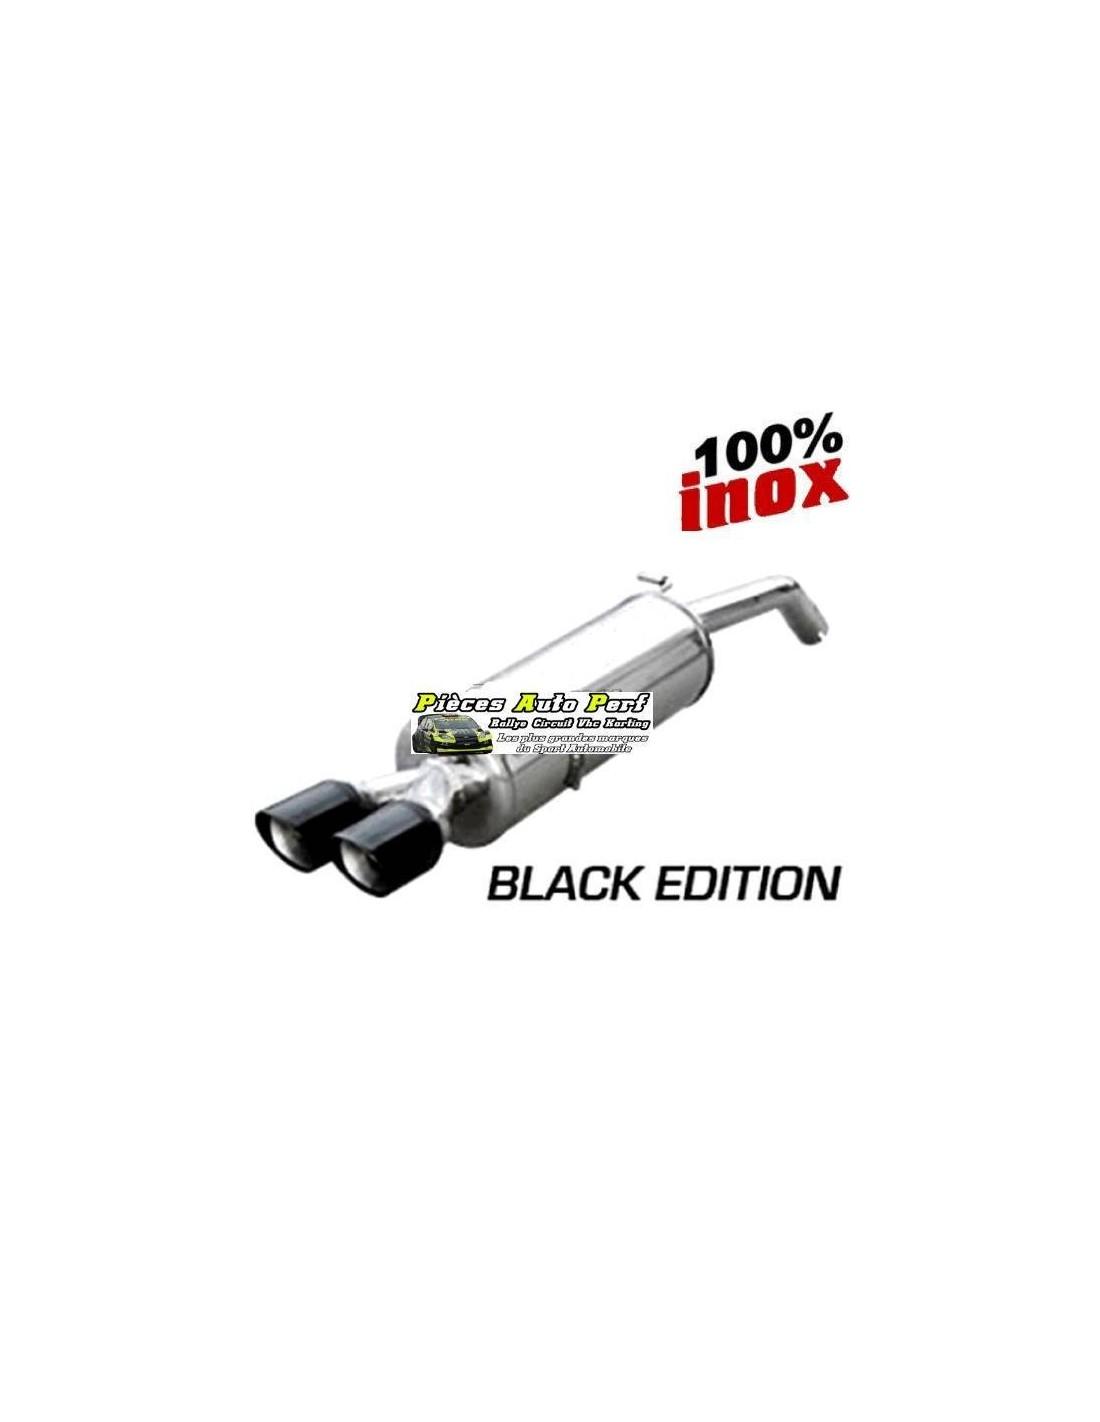 silencieux sport inox 2 sorties x race black citroen ds3 1l6 16v turbo racing. Black Bedroom Furniture Sets. Home Design Ideas